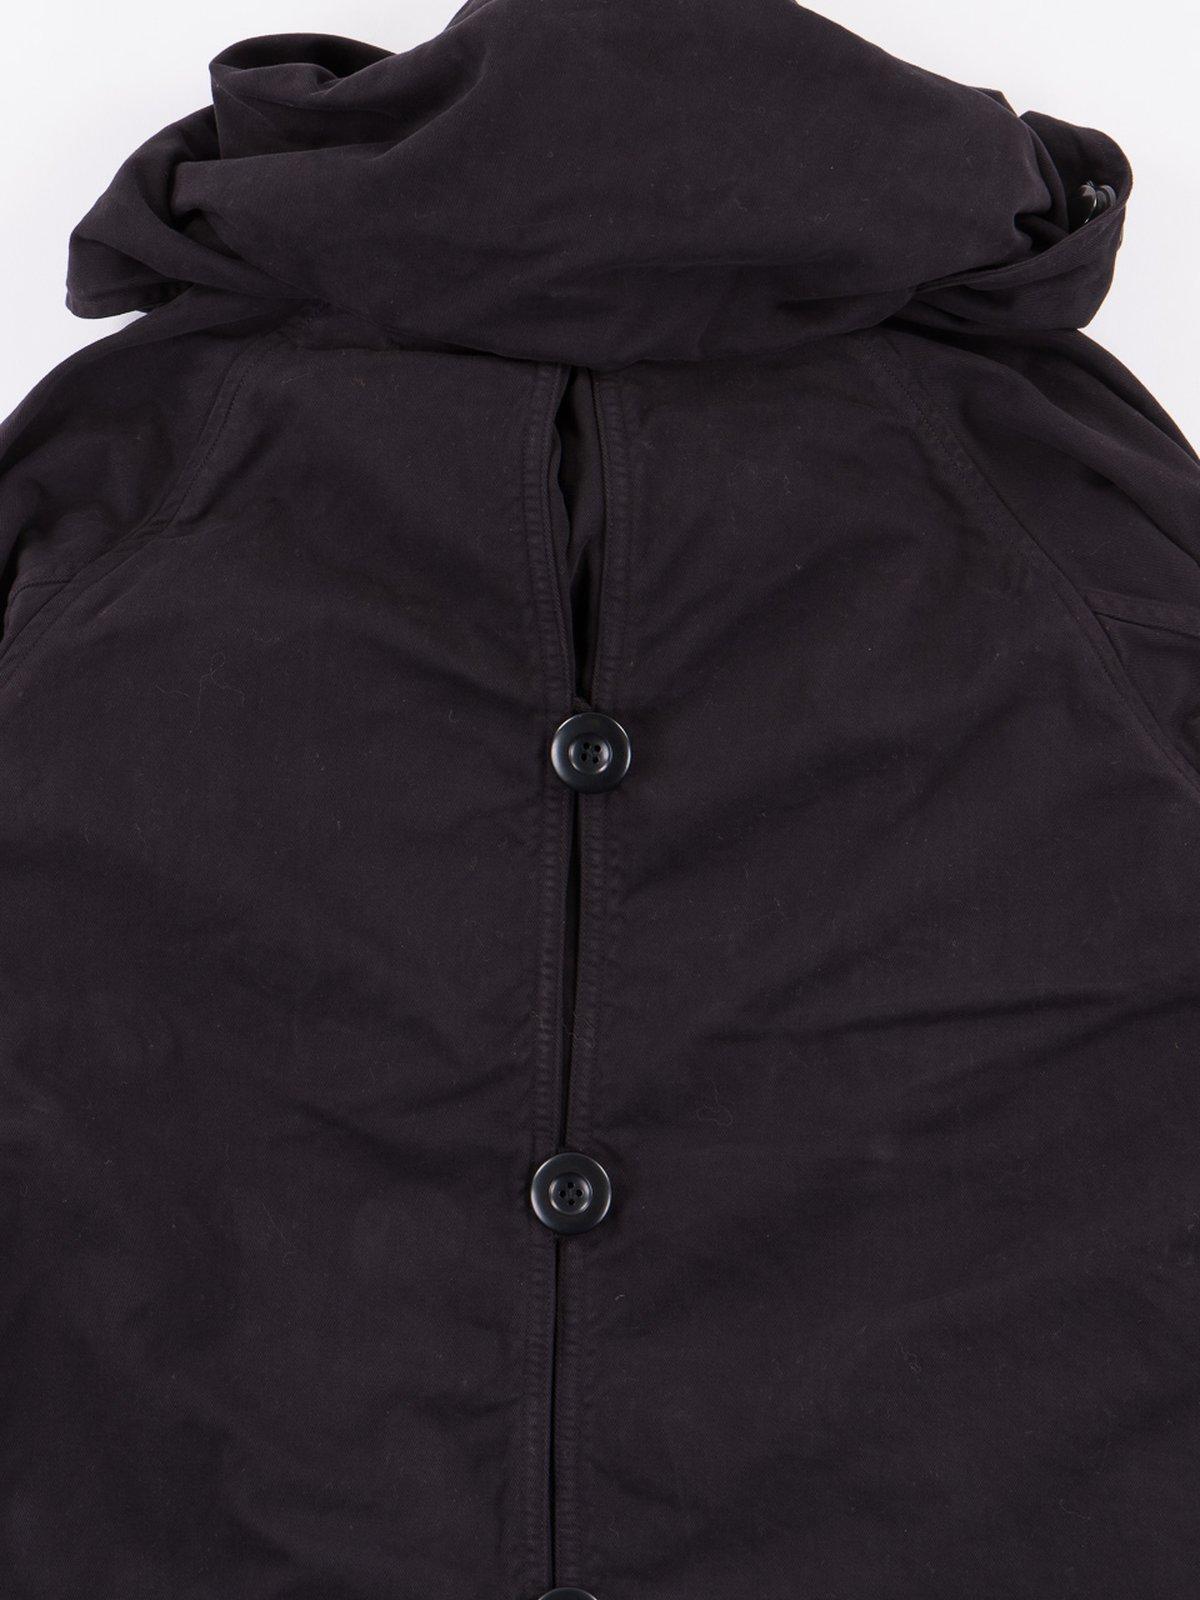 Black Brushed Twill Tri–P Ring Coat - Image 6